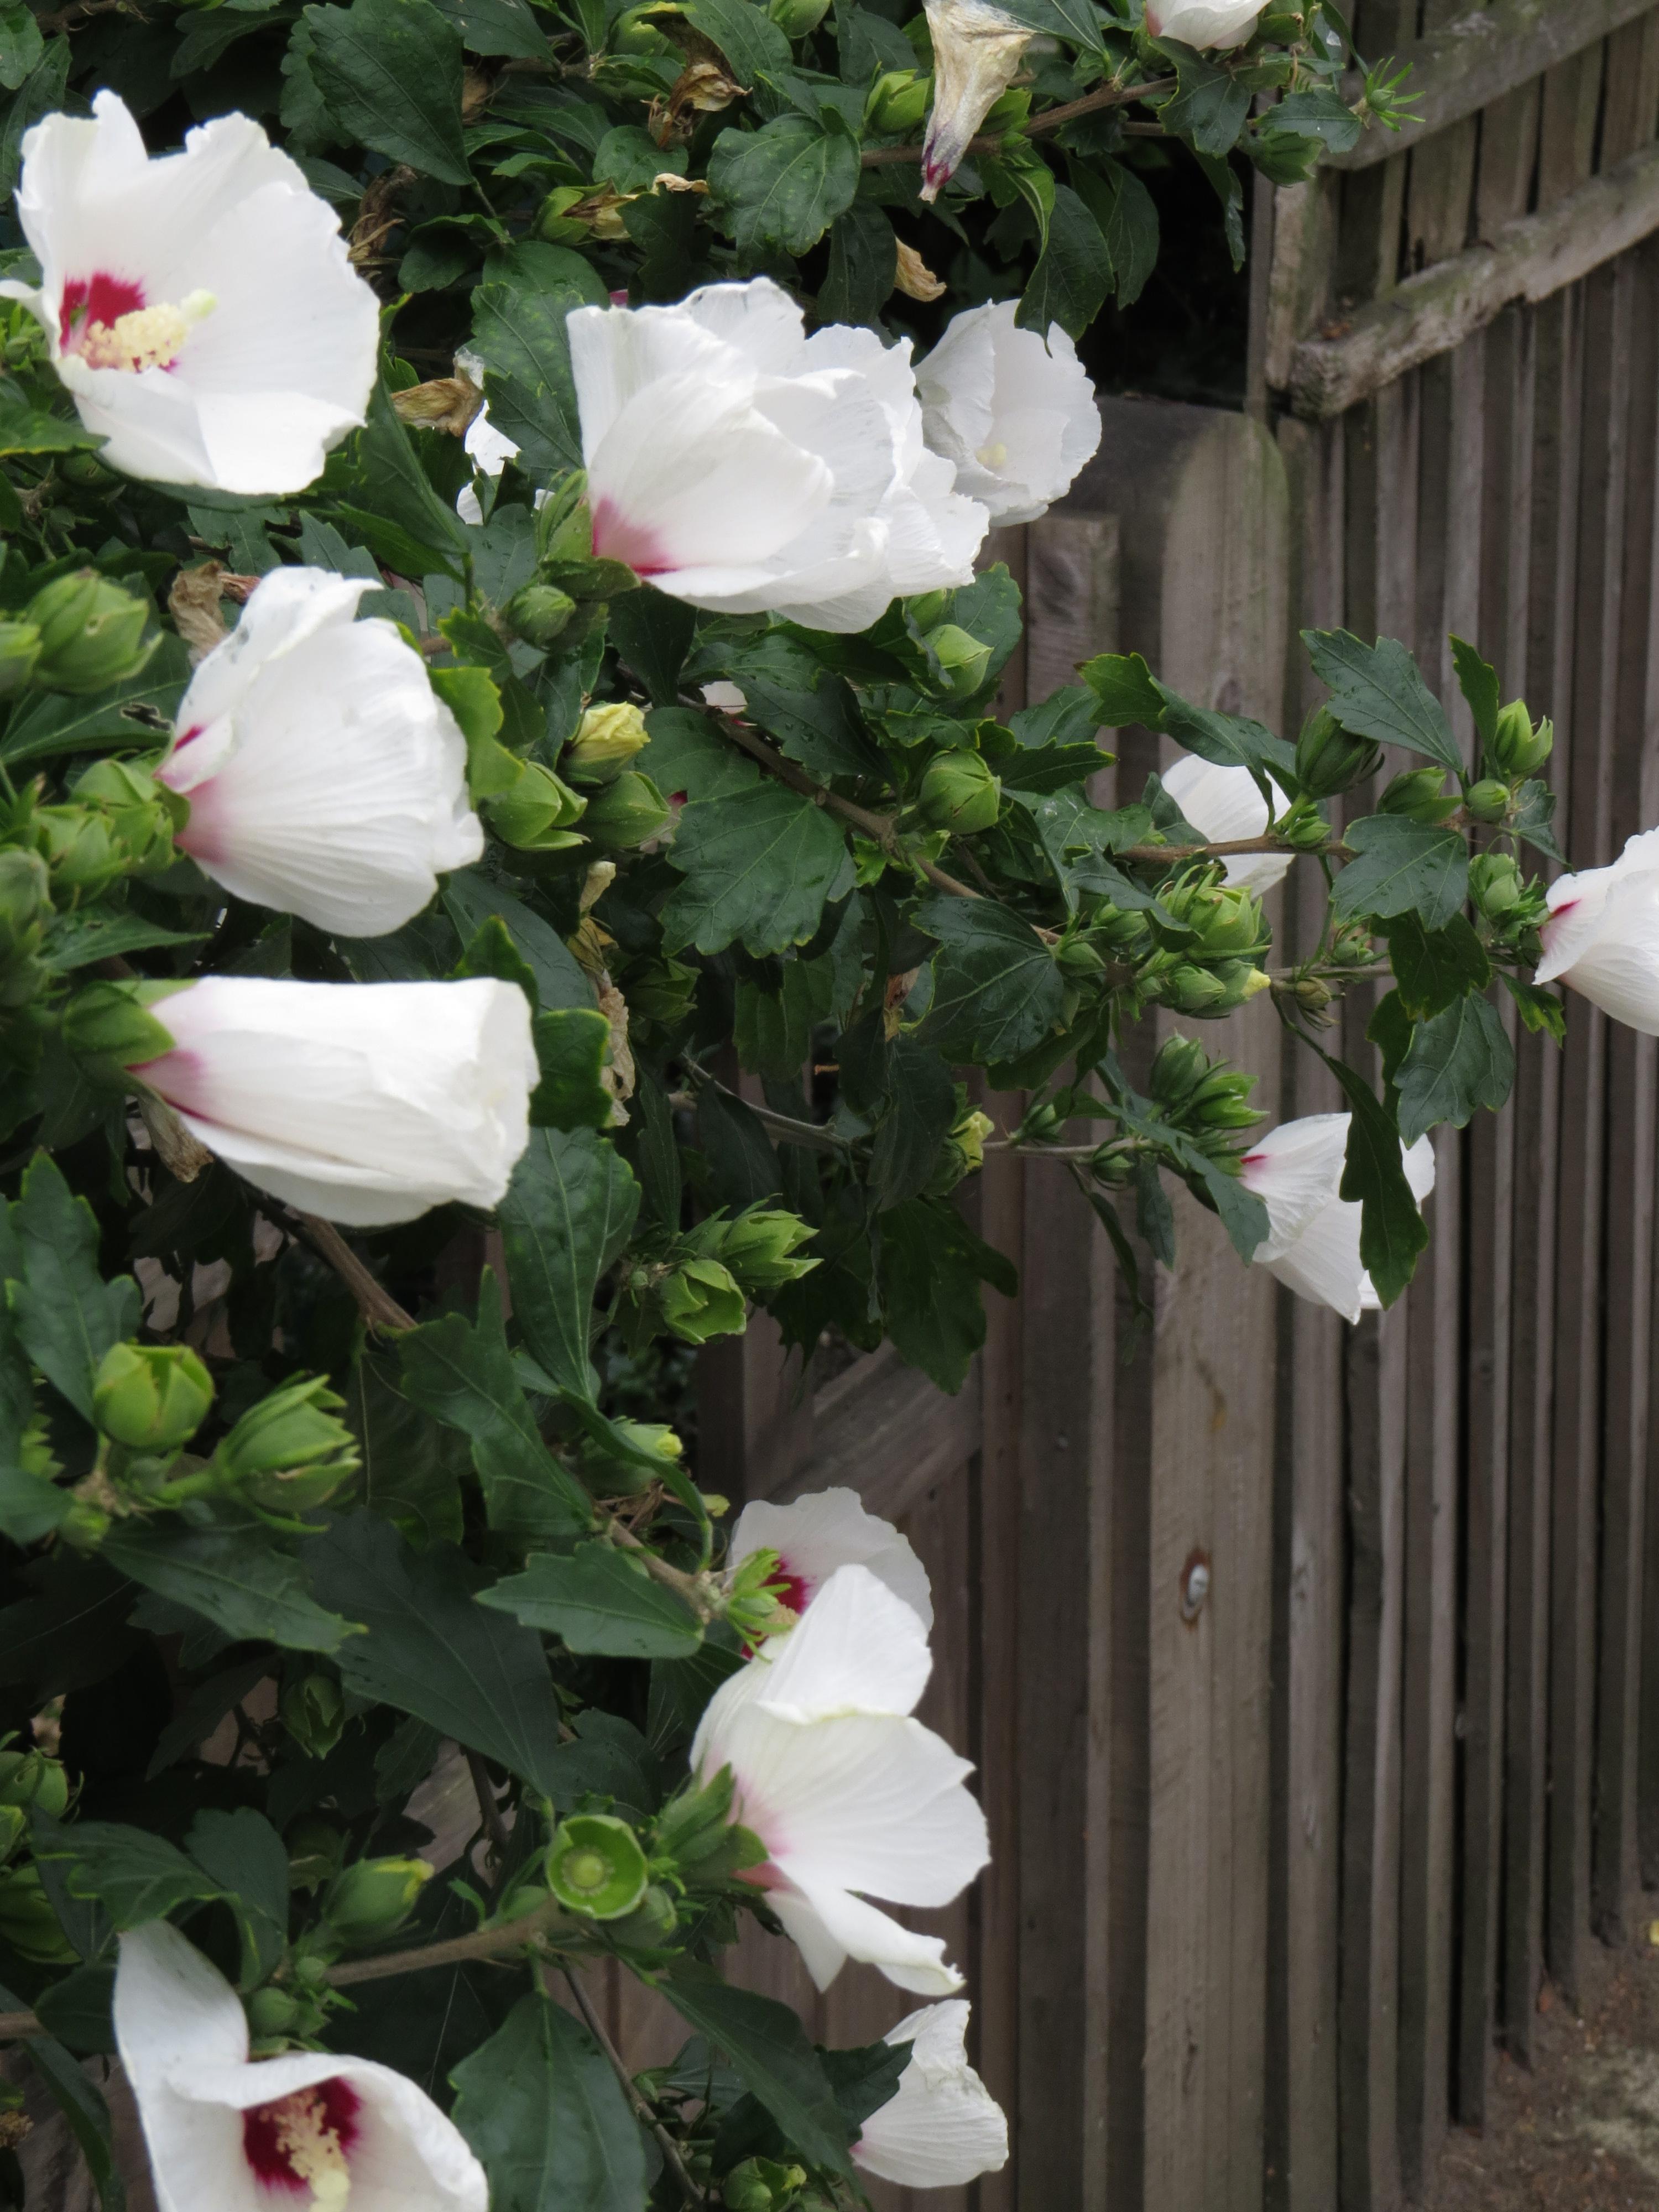 Wednesday Weed Hibiscus Bug Woman Adventures In London